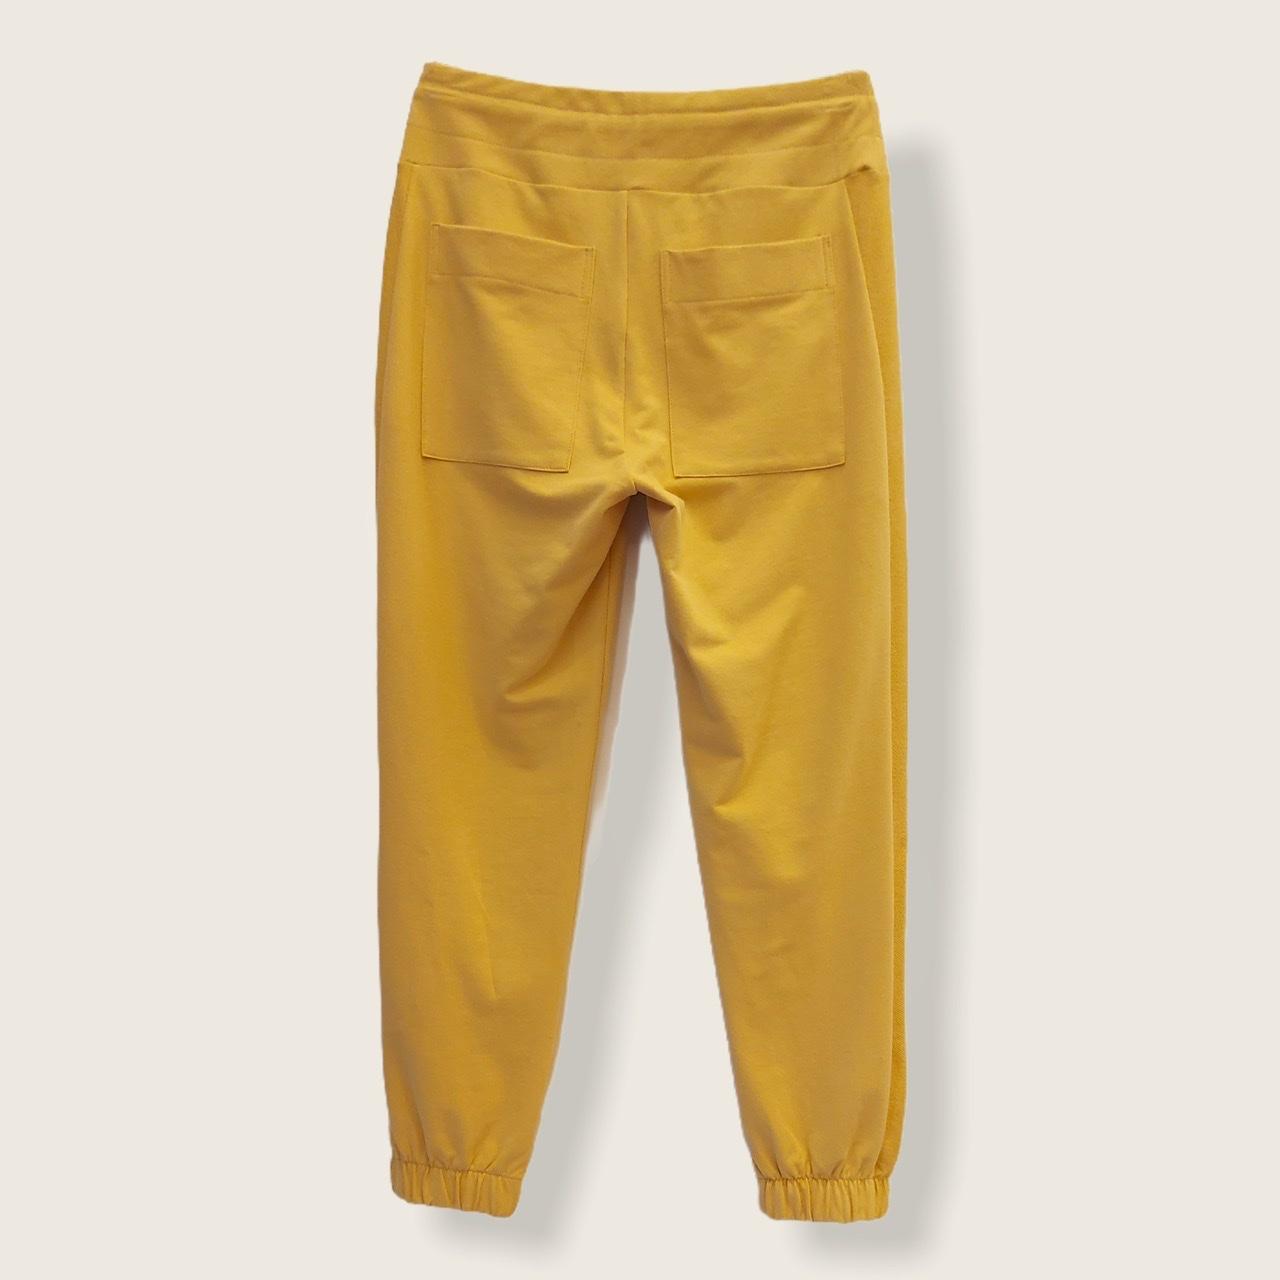 Calça Confort jogger amarela  - Vivian Bógus